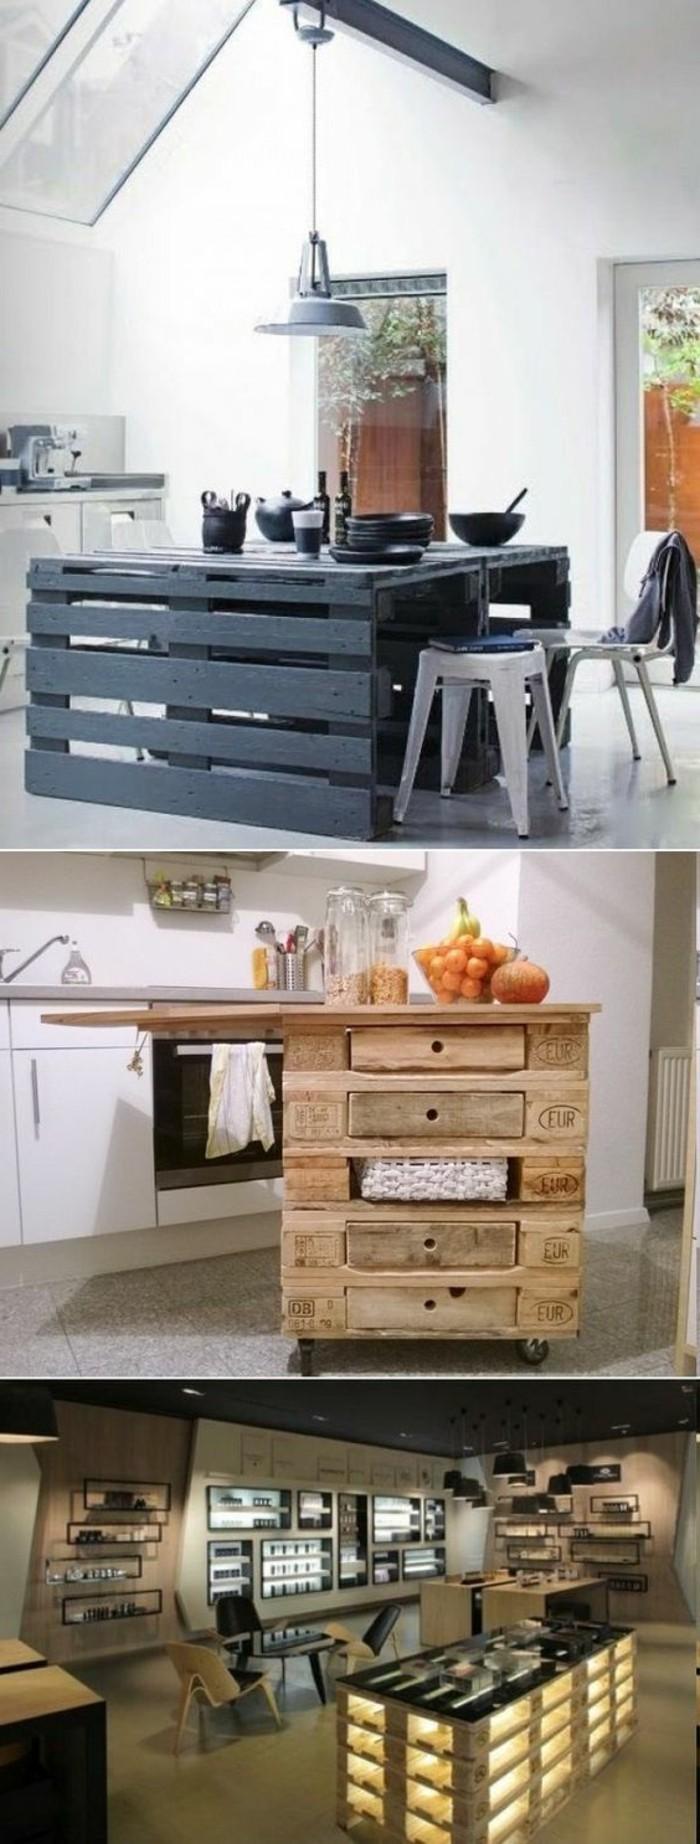 muebles-de-palets-mesa-de-comer-y-bar-de-palets